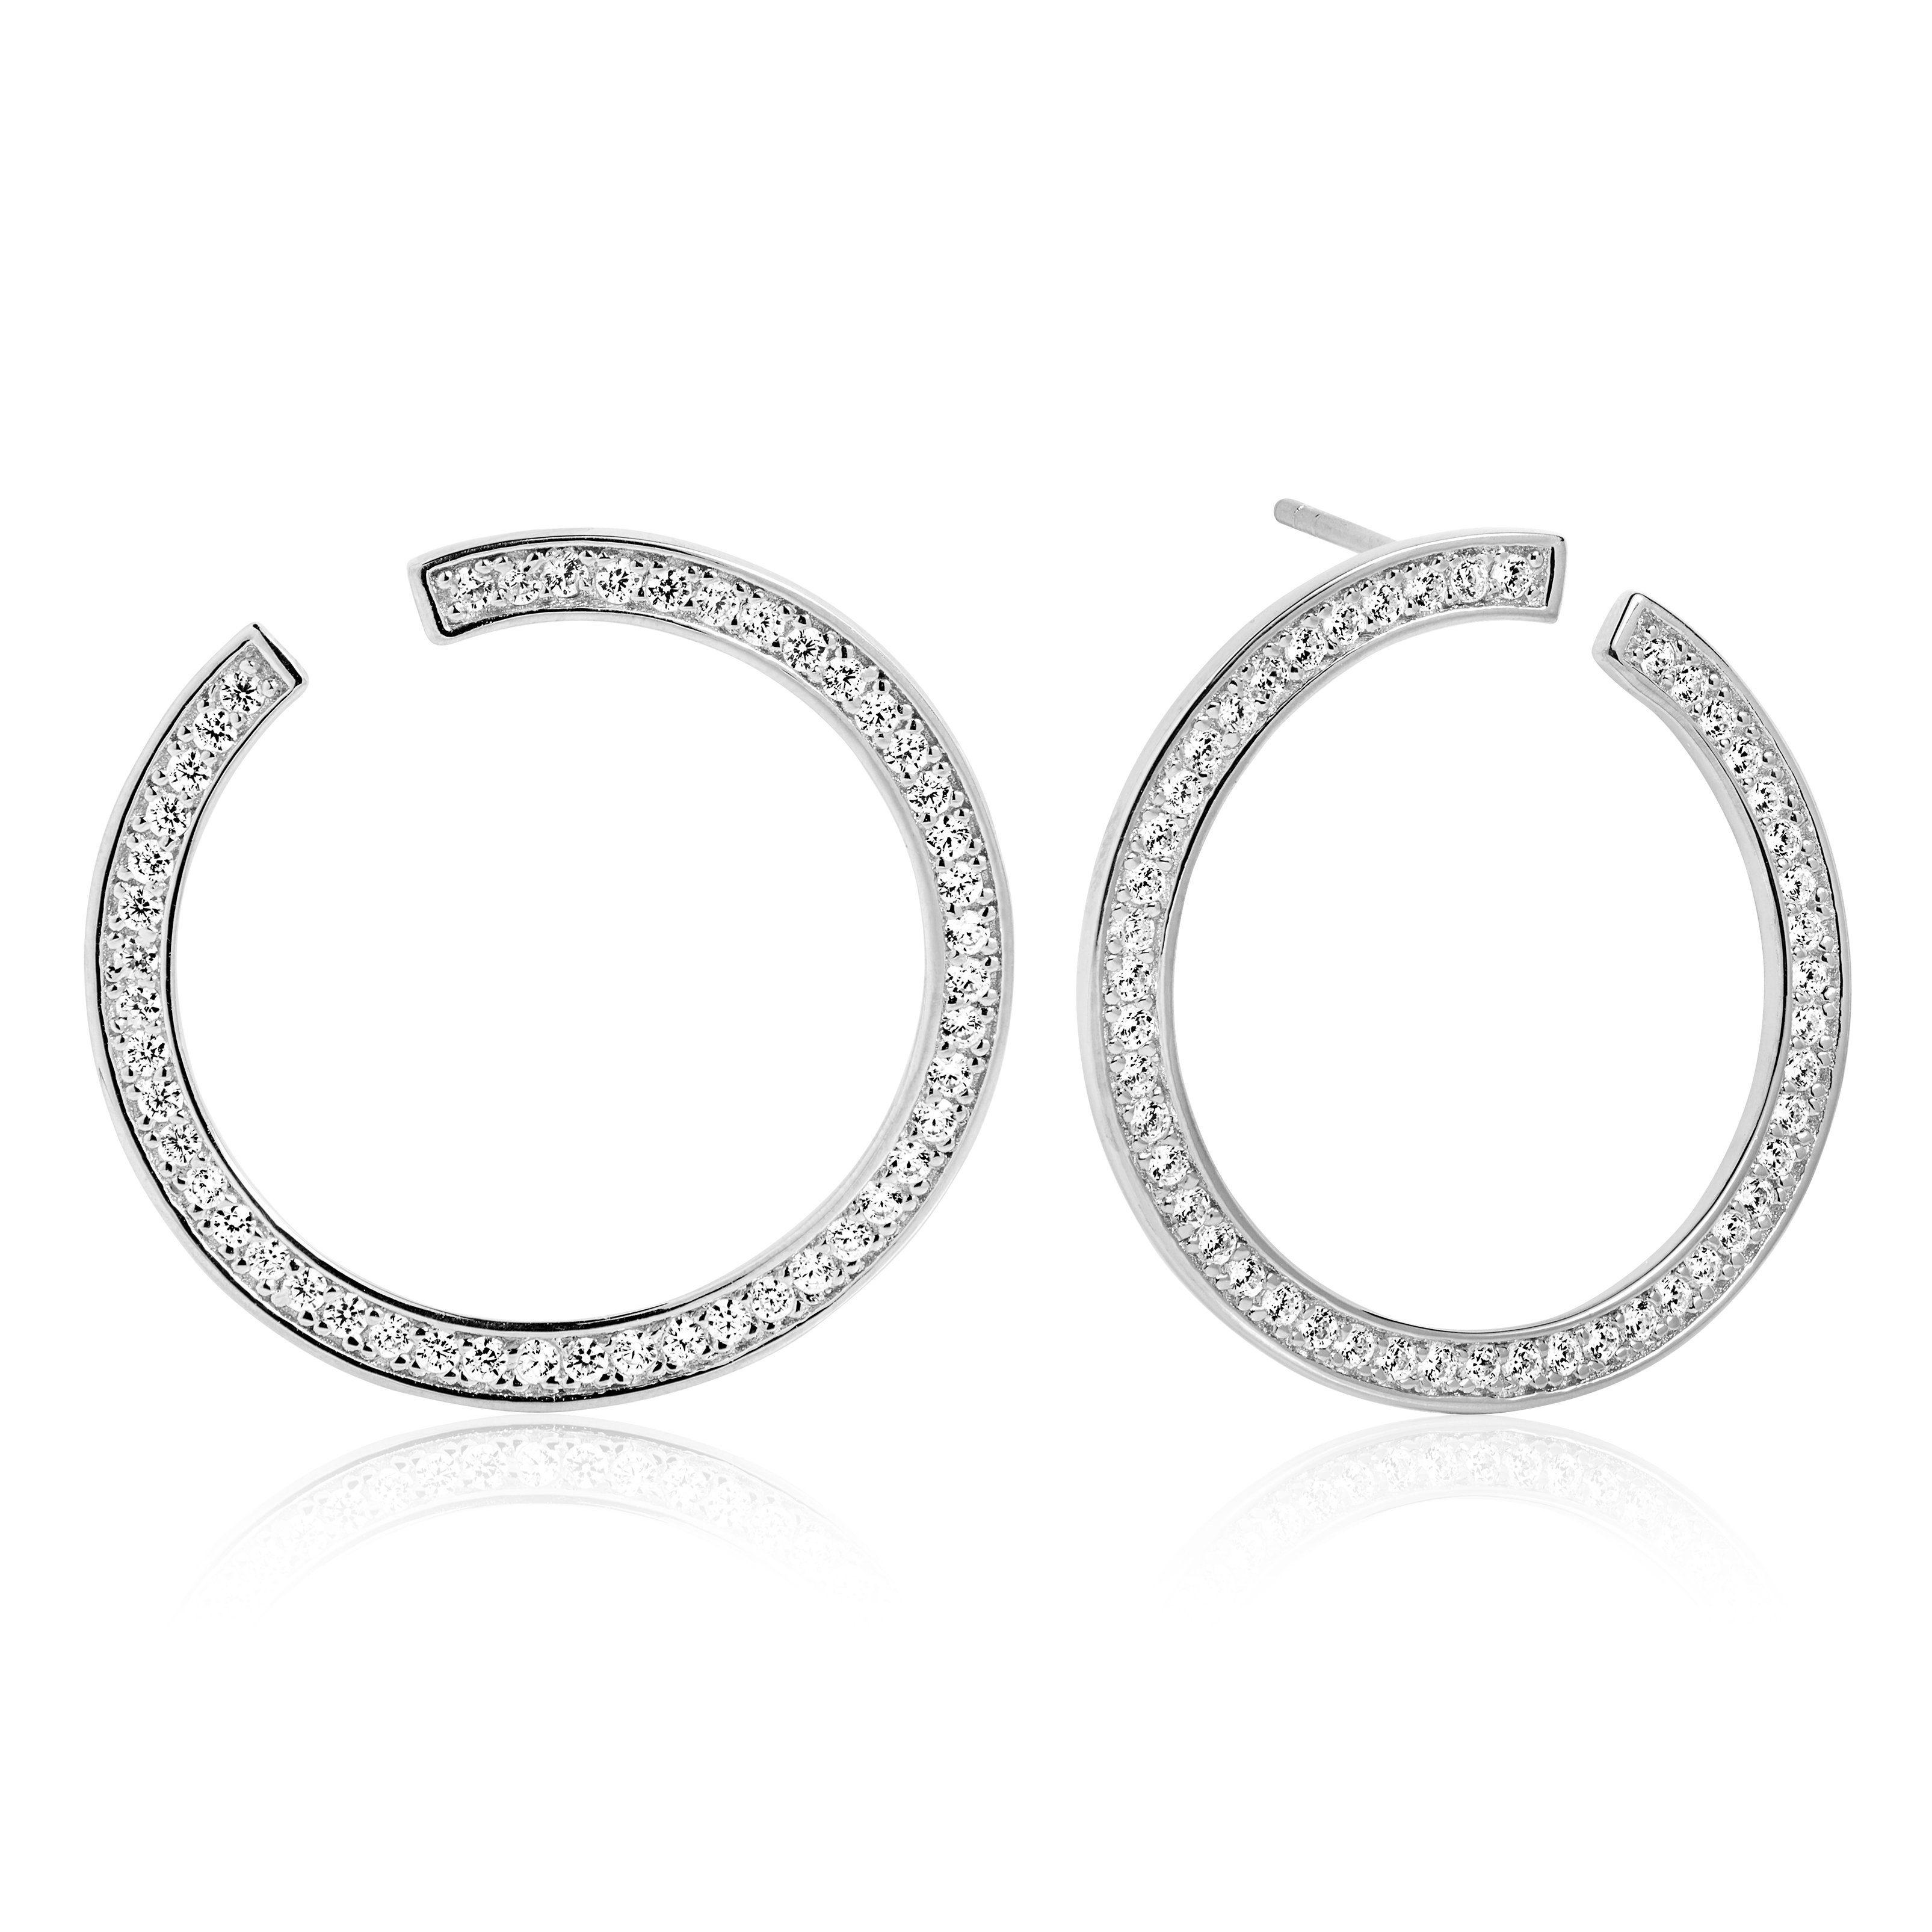 Sif Jakobs Jewellery Ohrringe im eleganten Look »VALIANO CIRCOLO GRANDE«